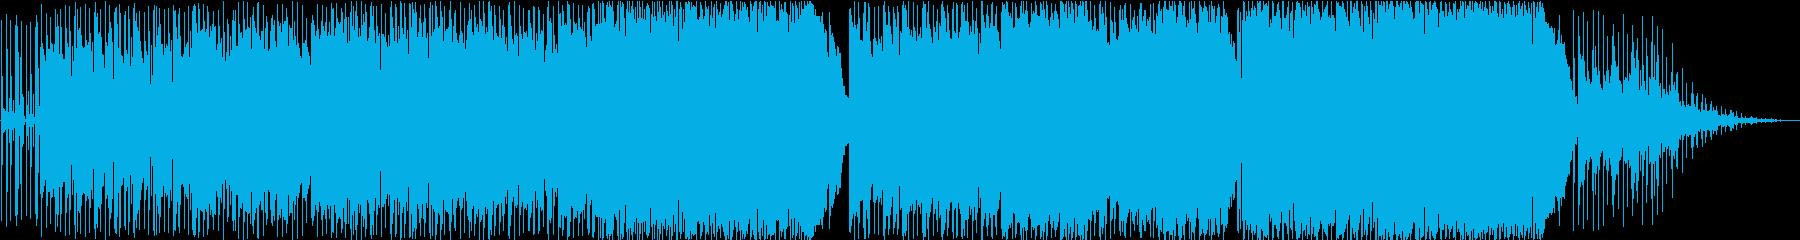 LEMON SOUNDSの再生済みの波形